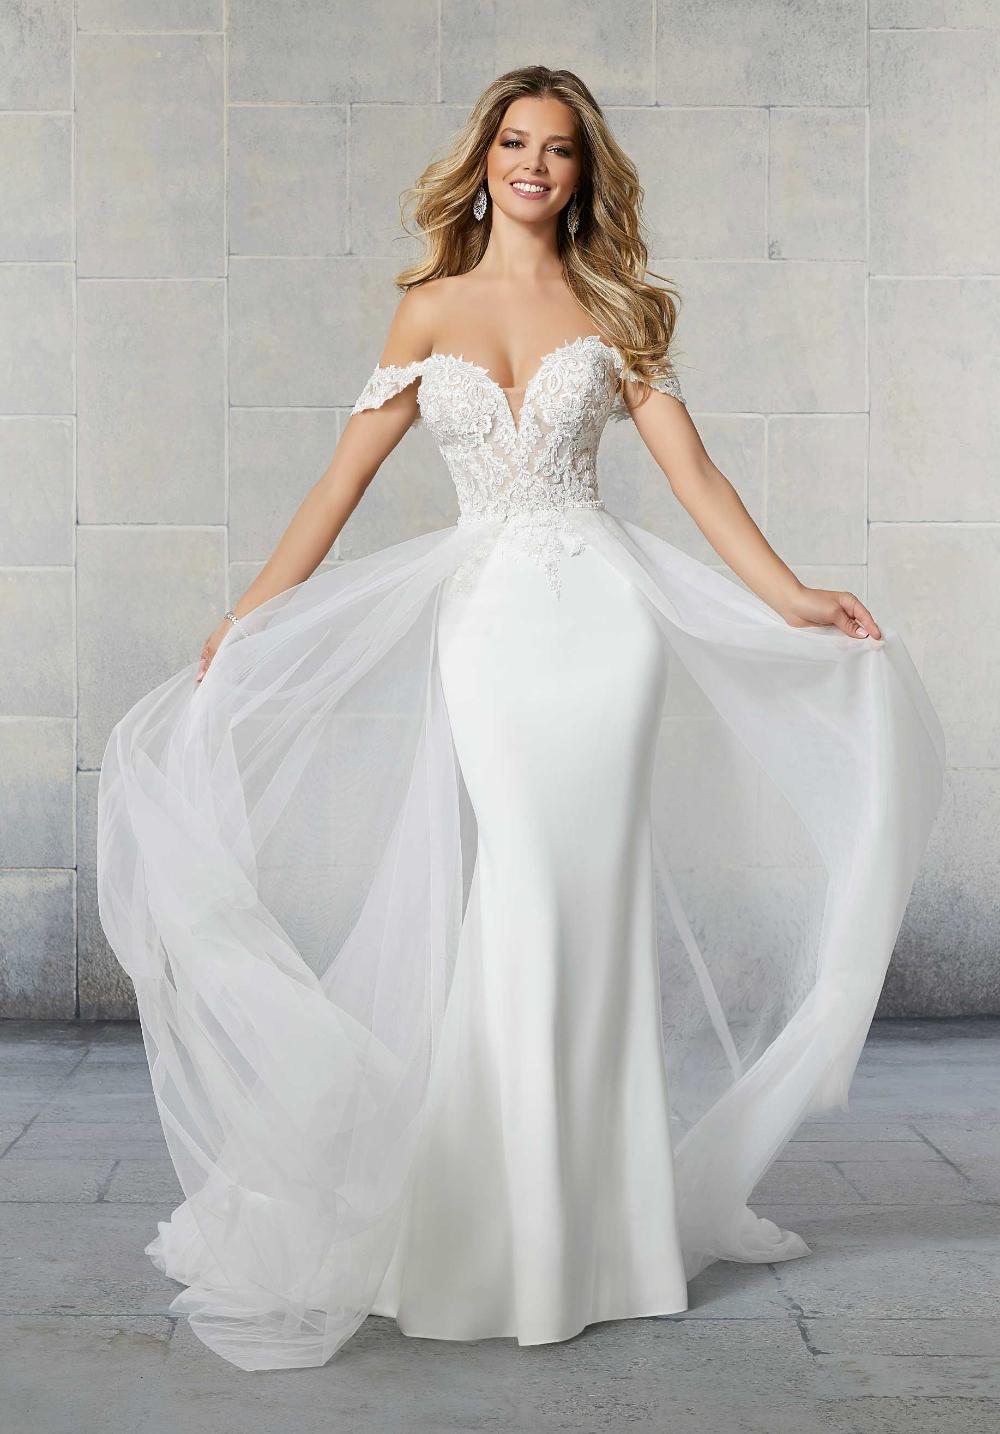 Detachable Train Wedding Dress, Tulle Overskirt, Off the